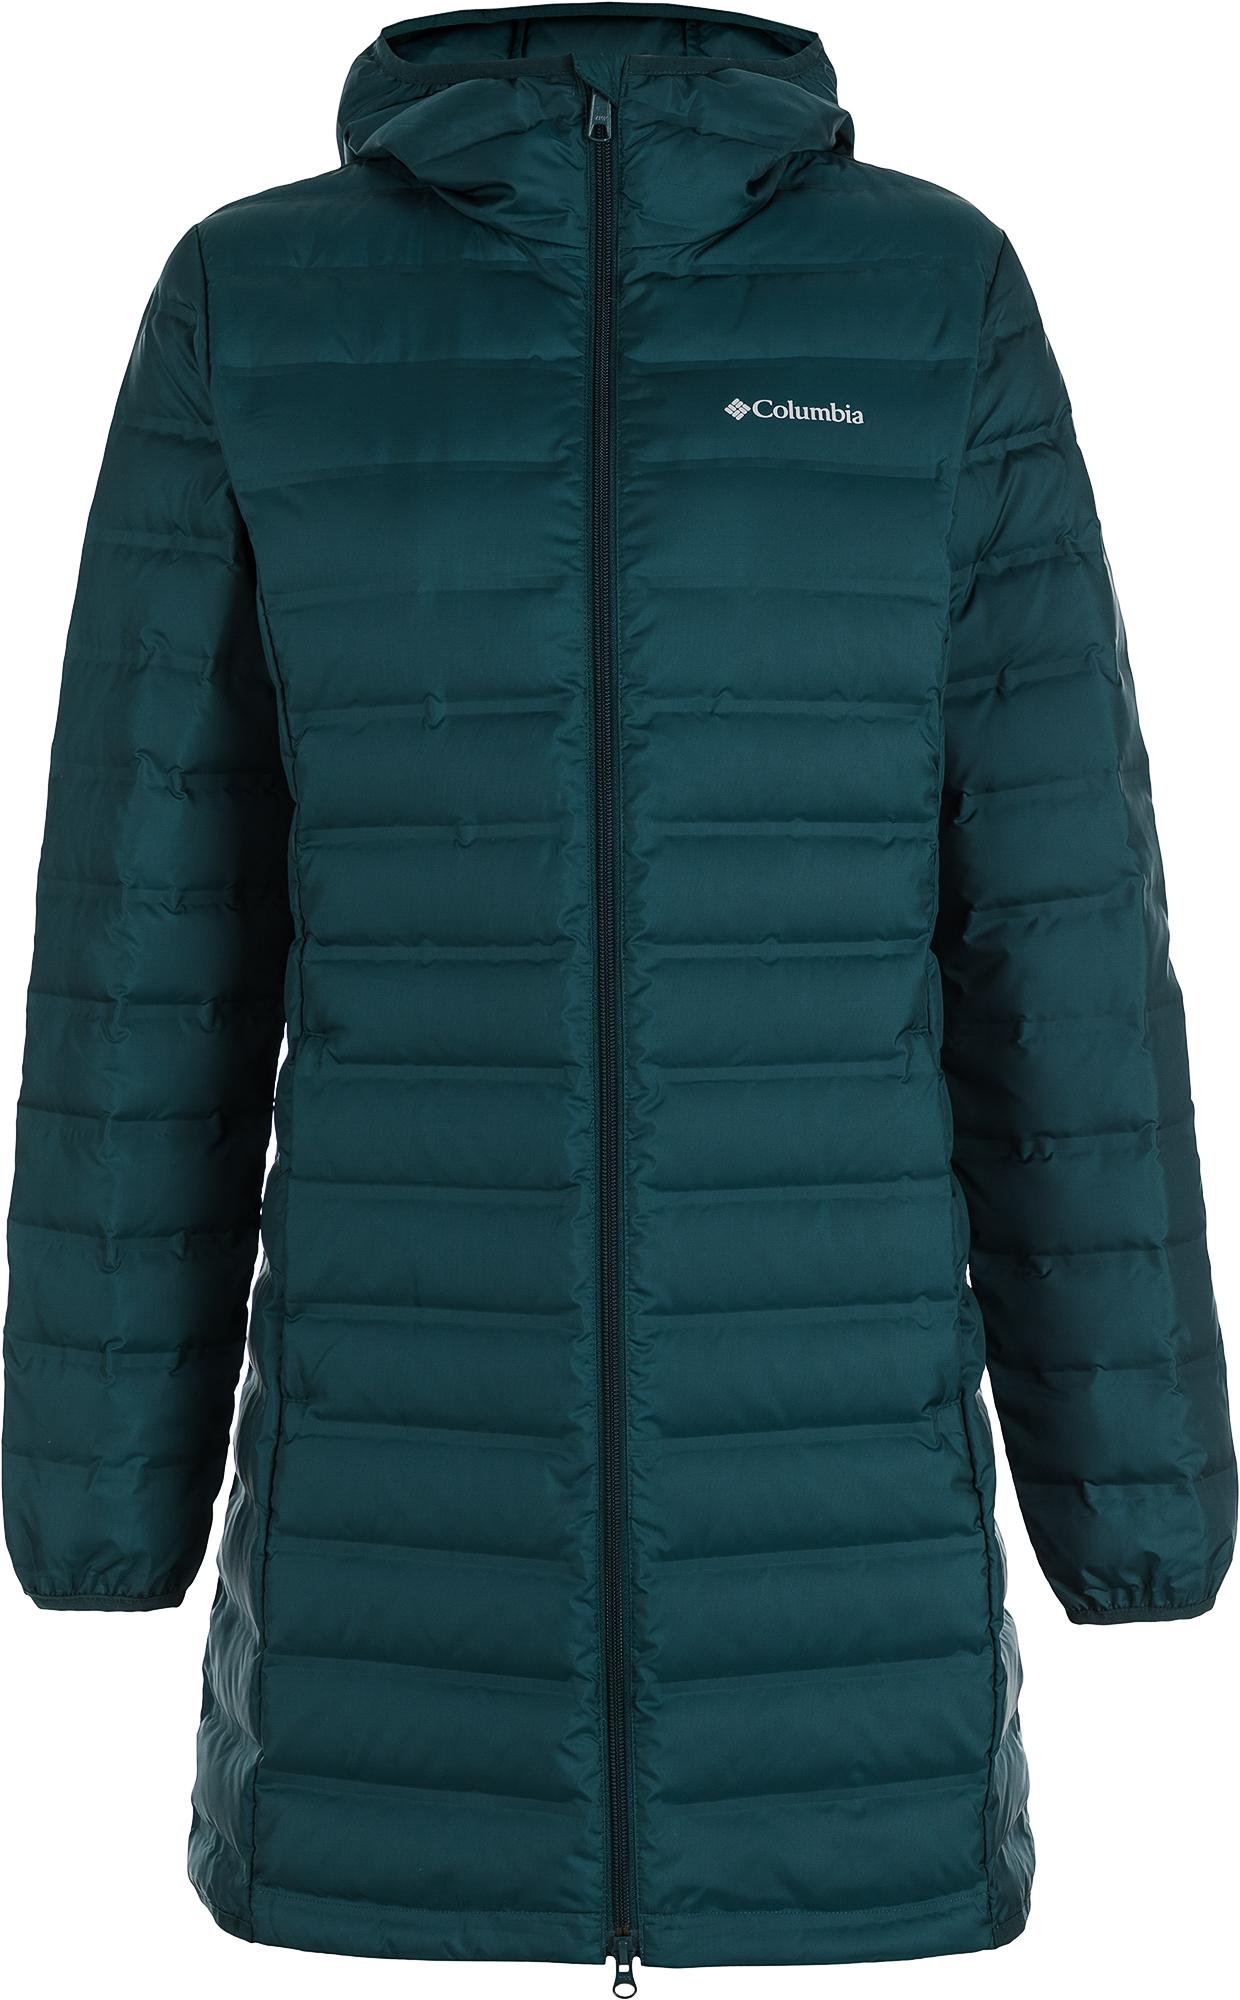 Columbia Куртка пуховая женская Columbia Lake 22, размер 44 цена